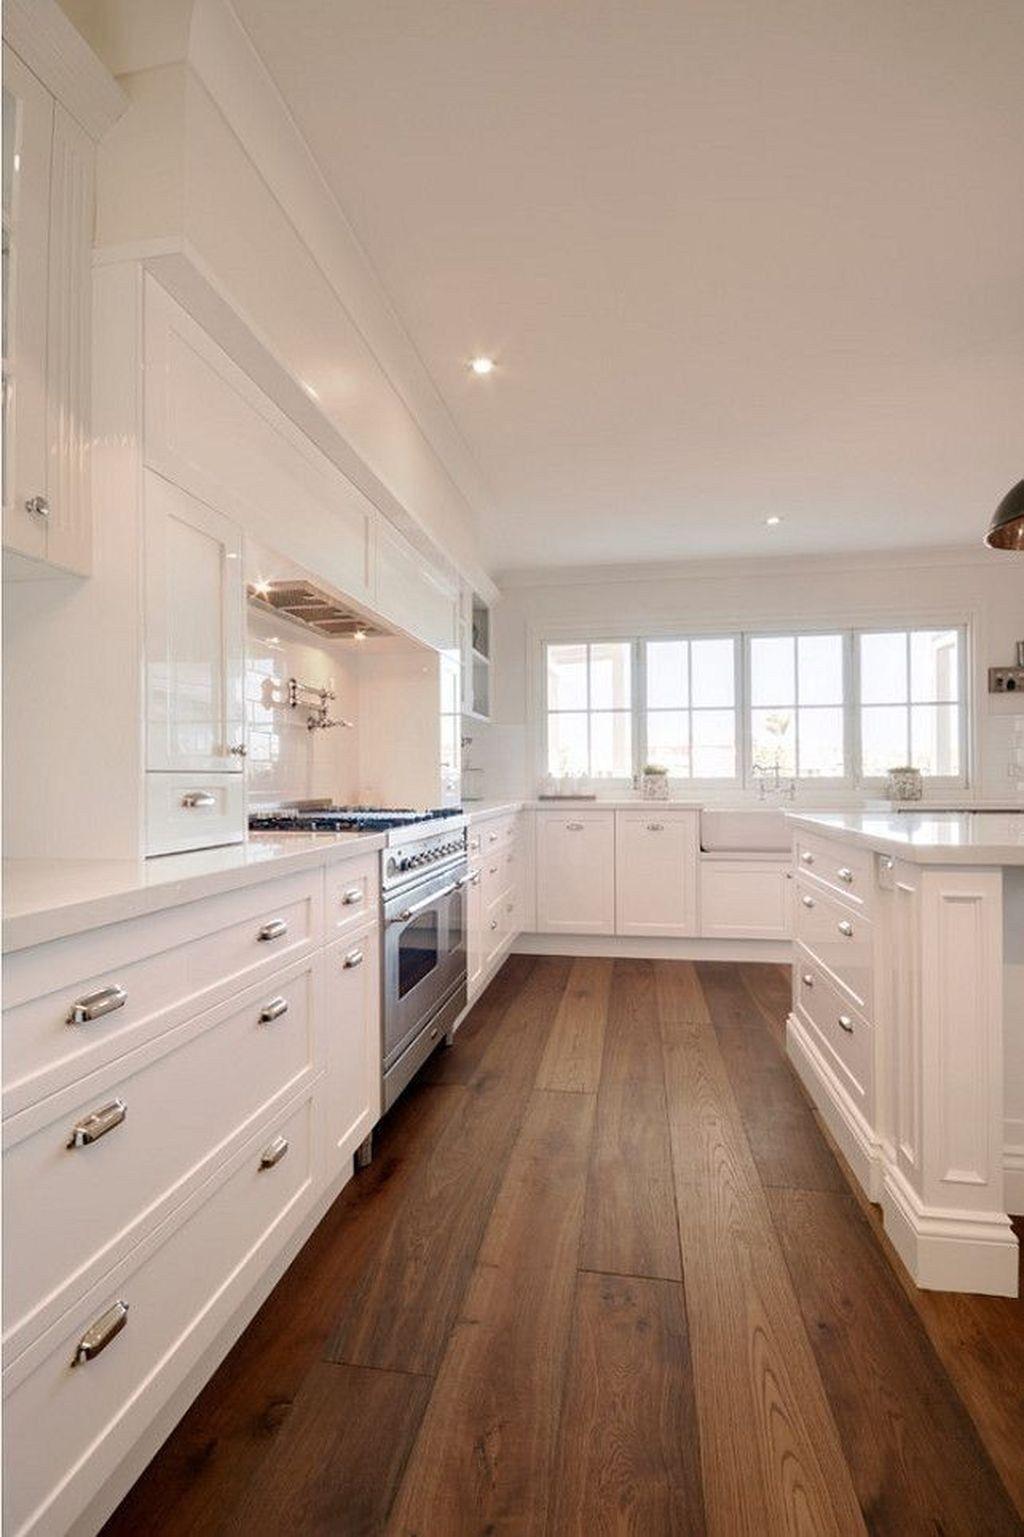 46 luxury white kitchen design ideas to get elegant look flooring trends hardwood plank on kitchen remodel floor id=65080